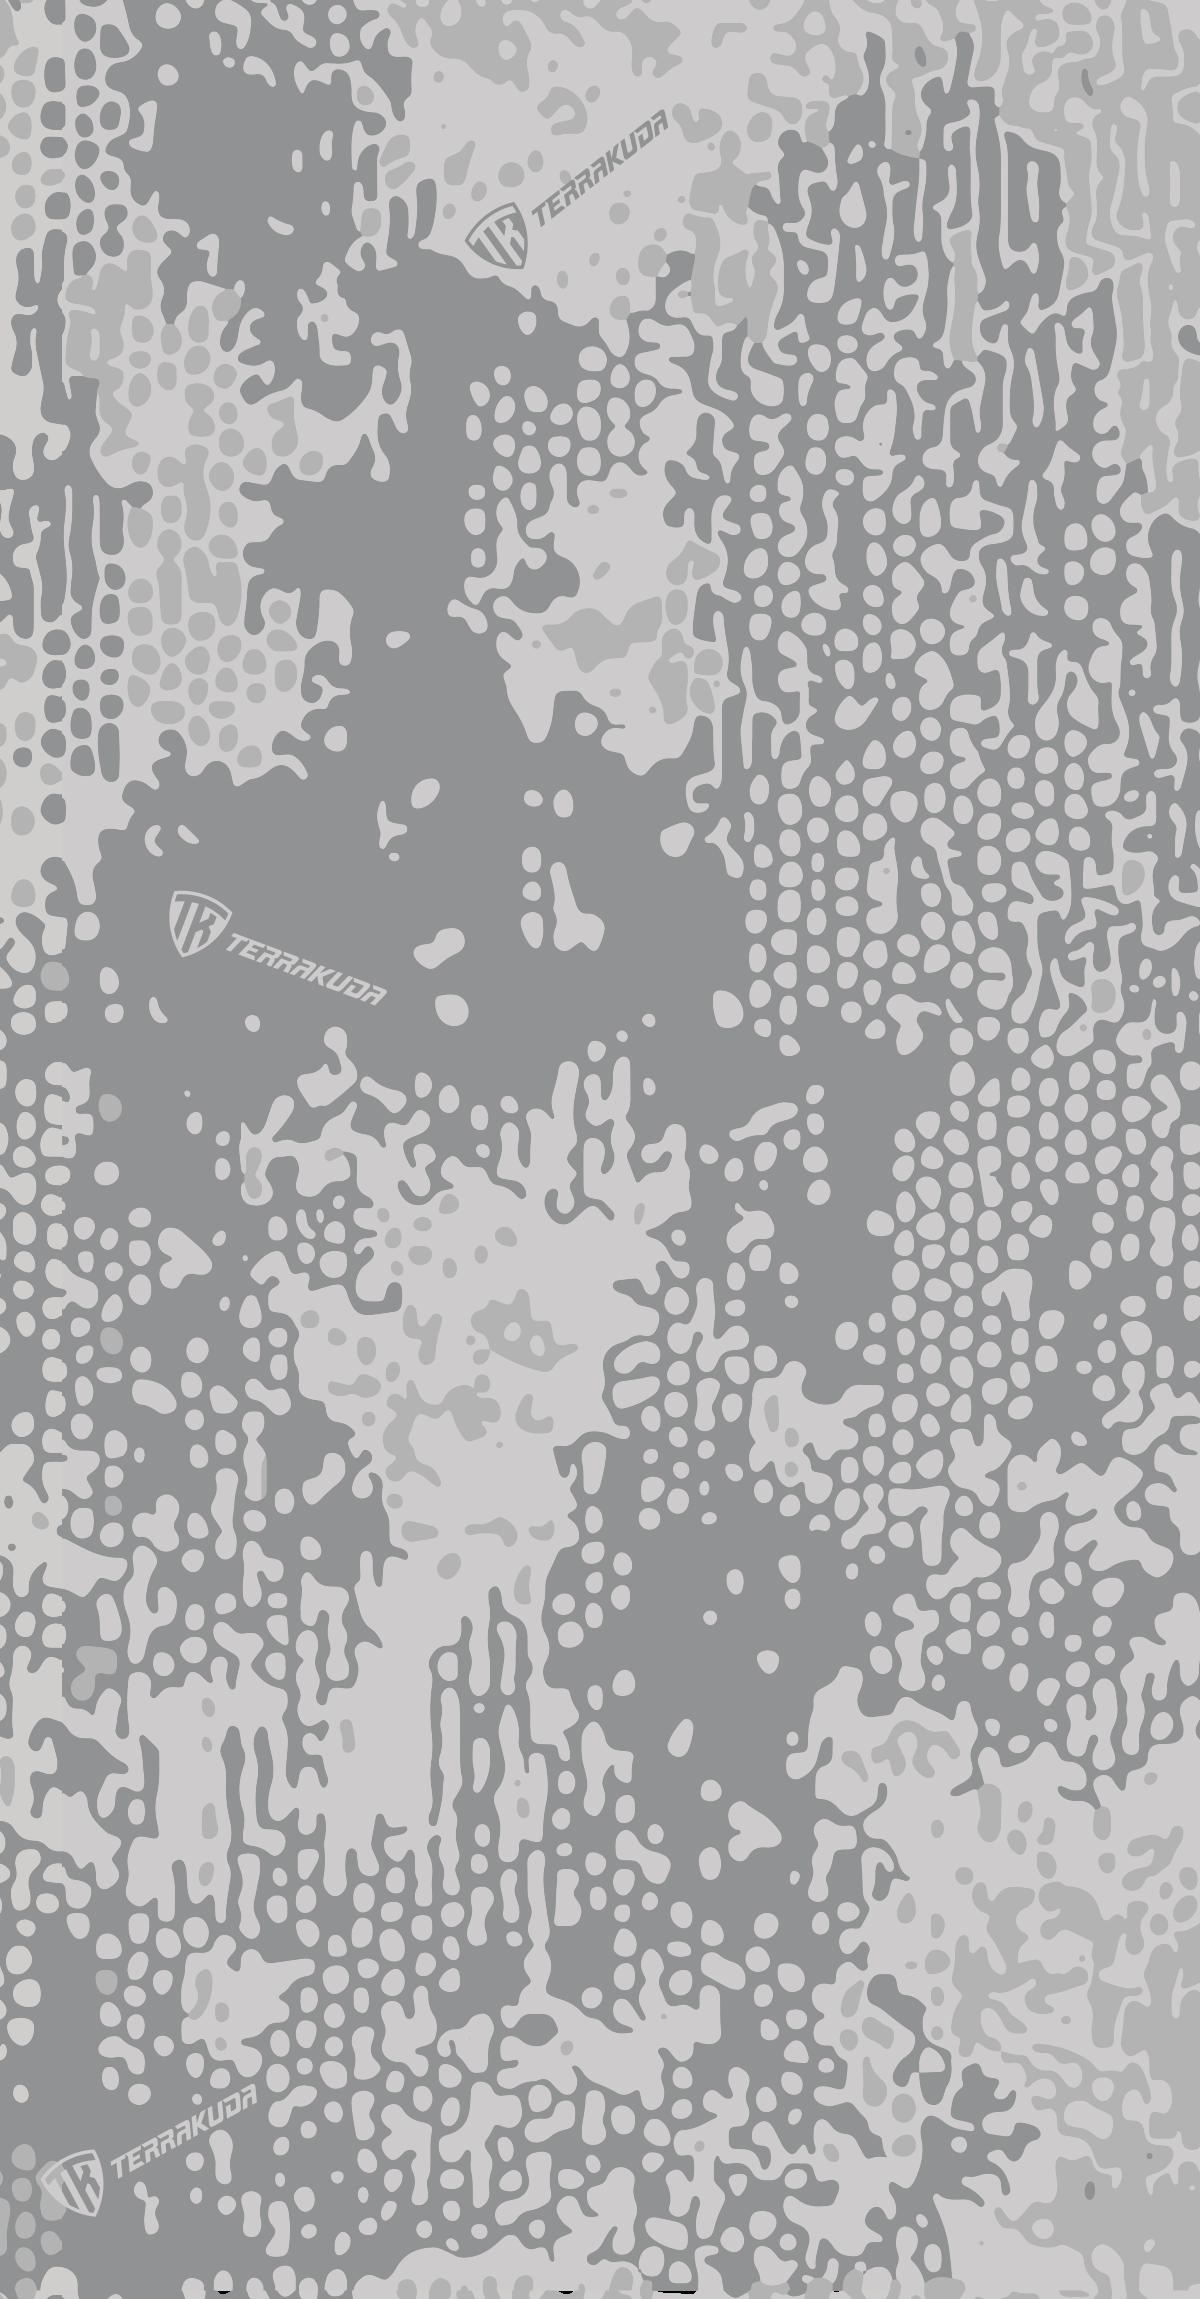 new logo in pattern design